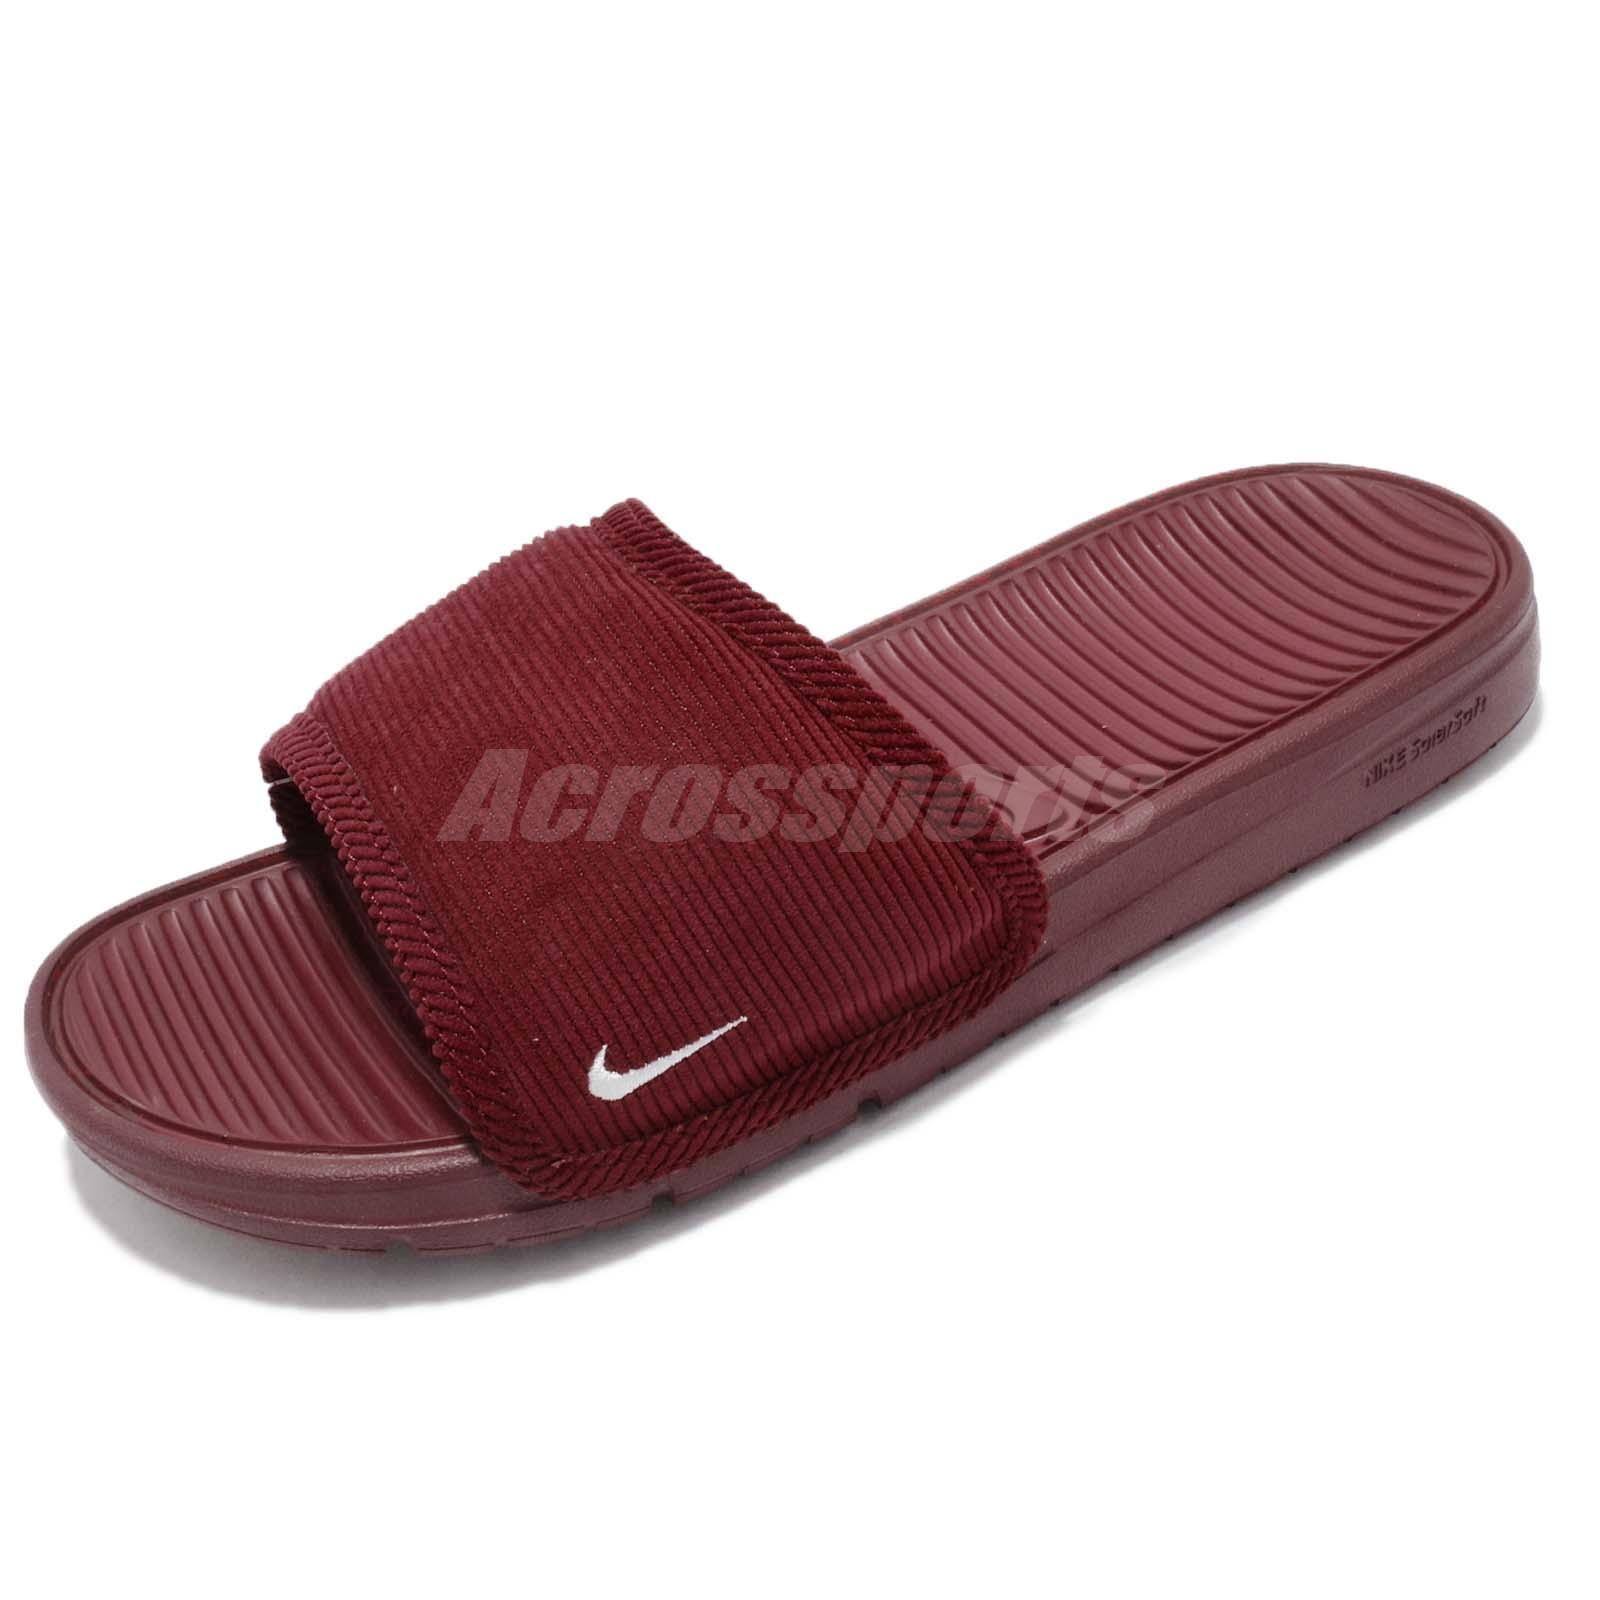 795b6c6051c Nike Benassi Solarsft Slide SP Corduroy Textile Pack Red Men Sandals  696116-616